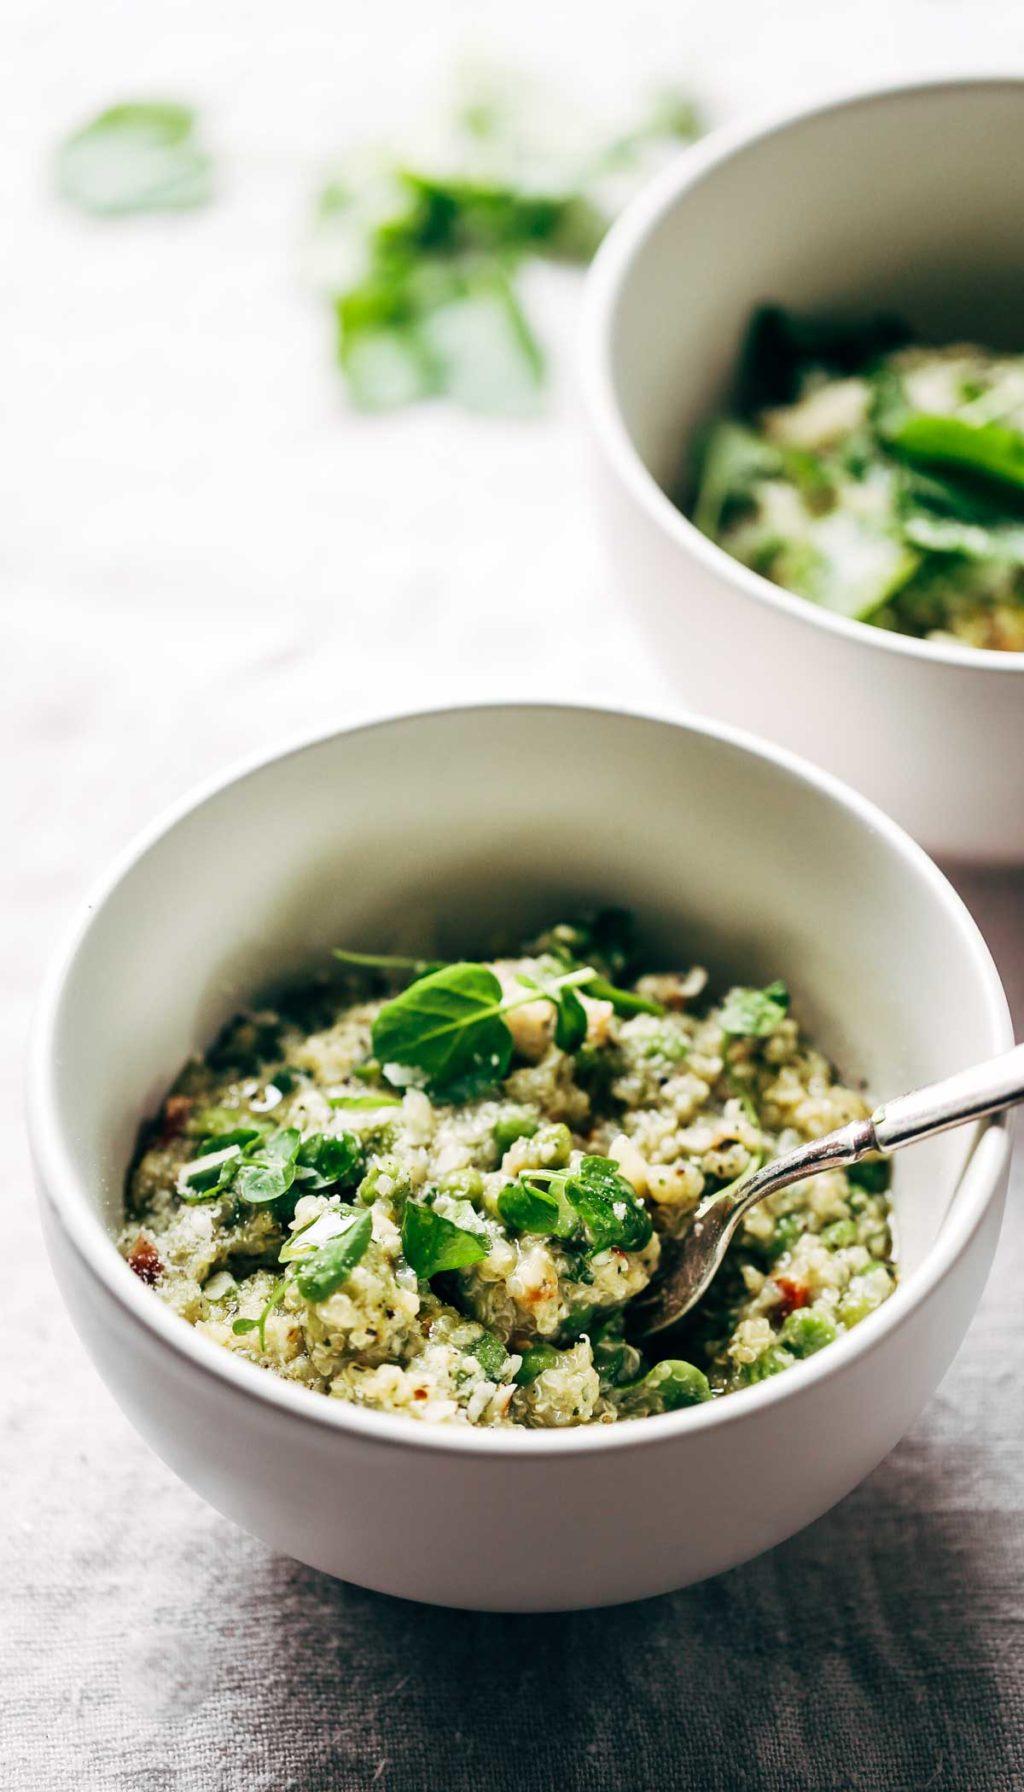 Frango primavera com quinoa 1